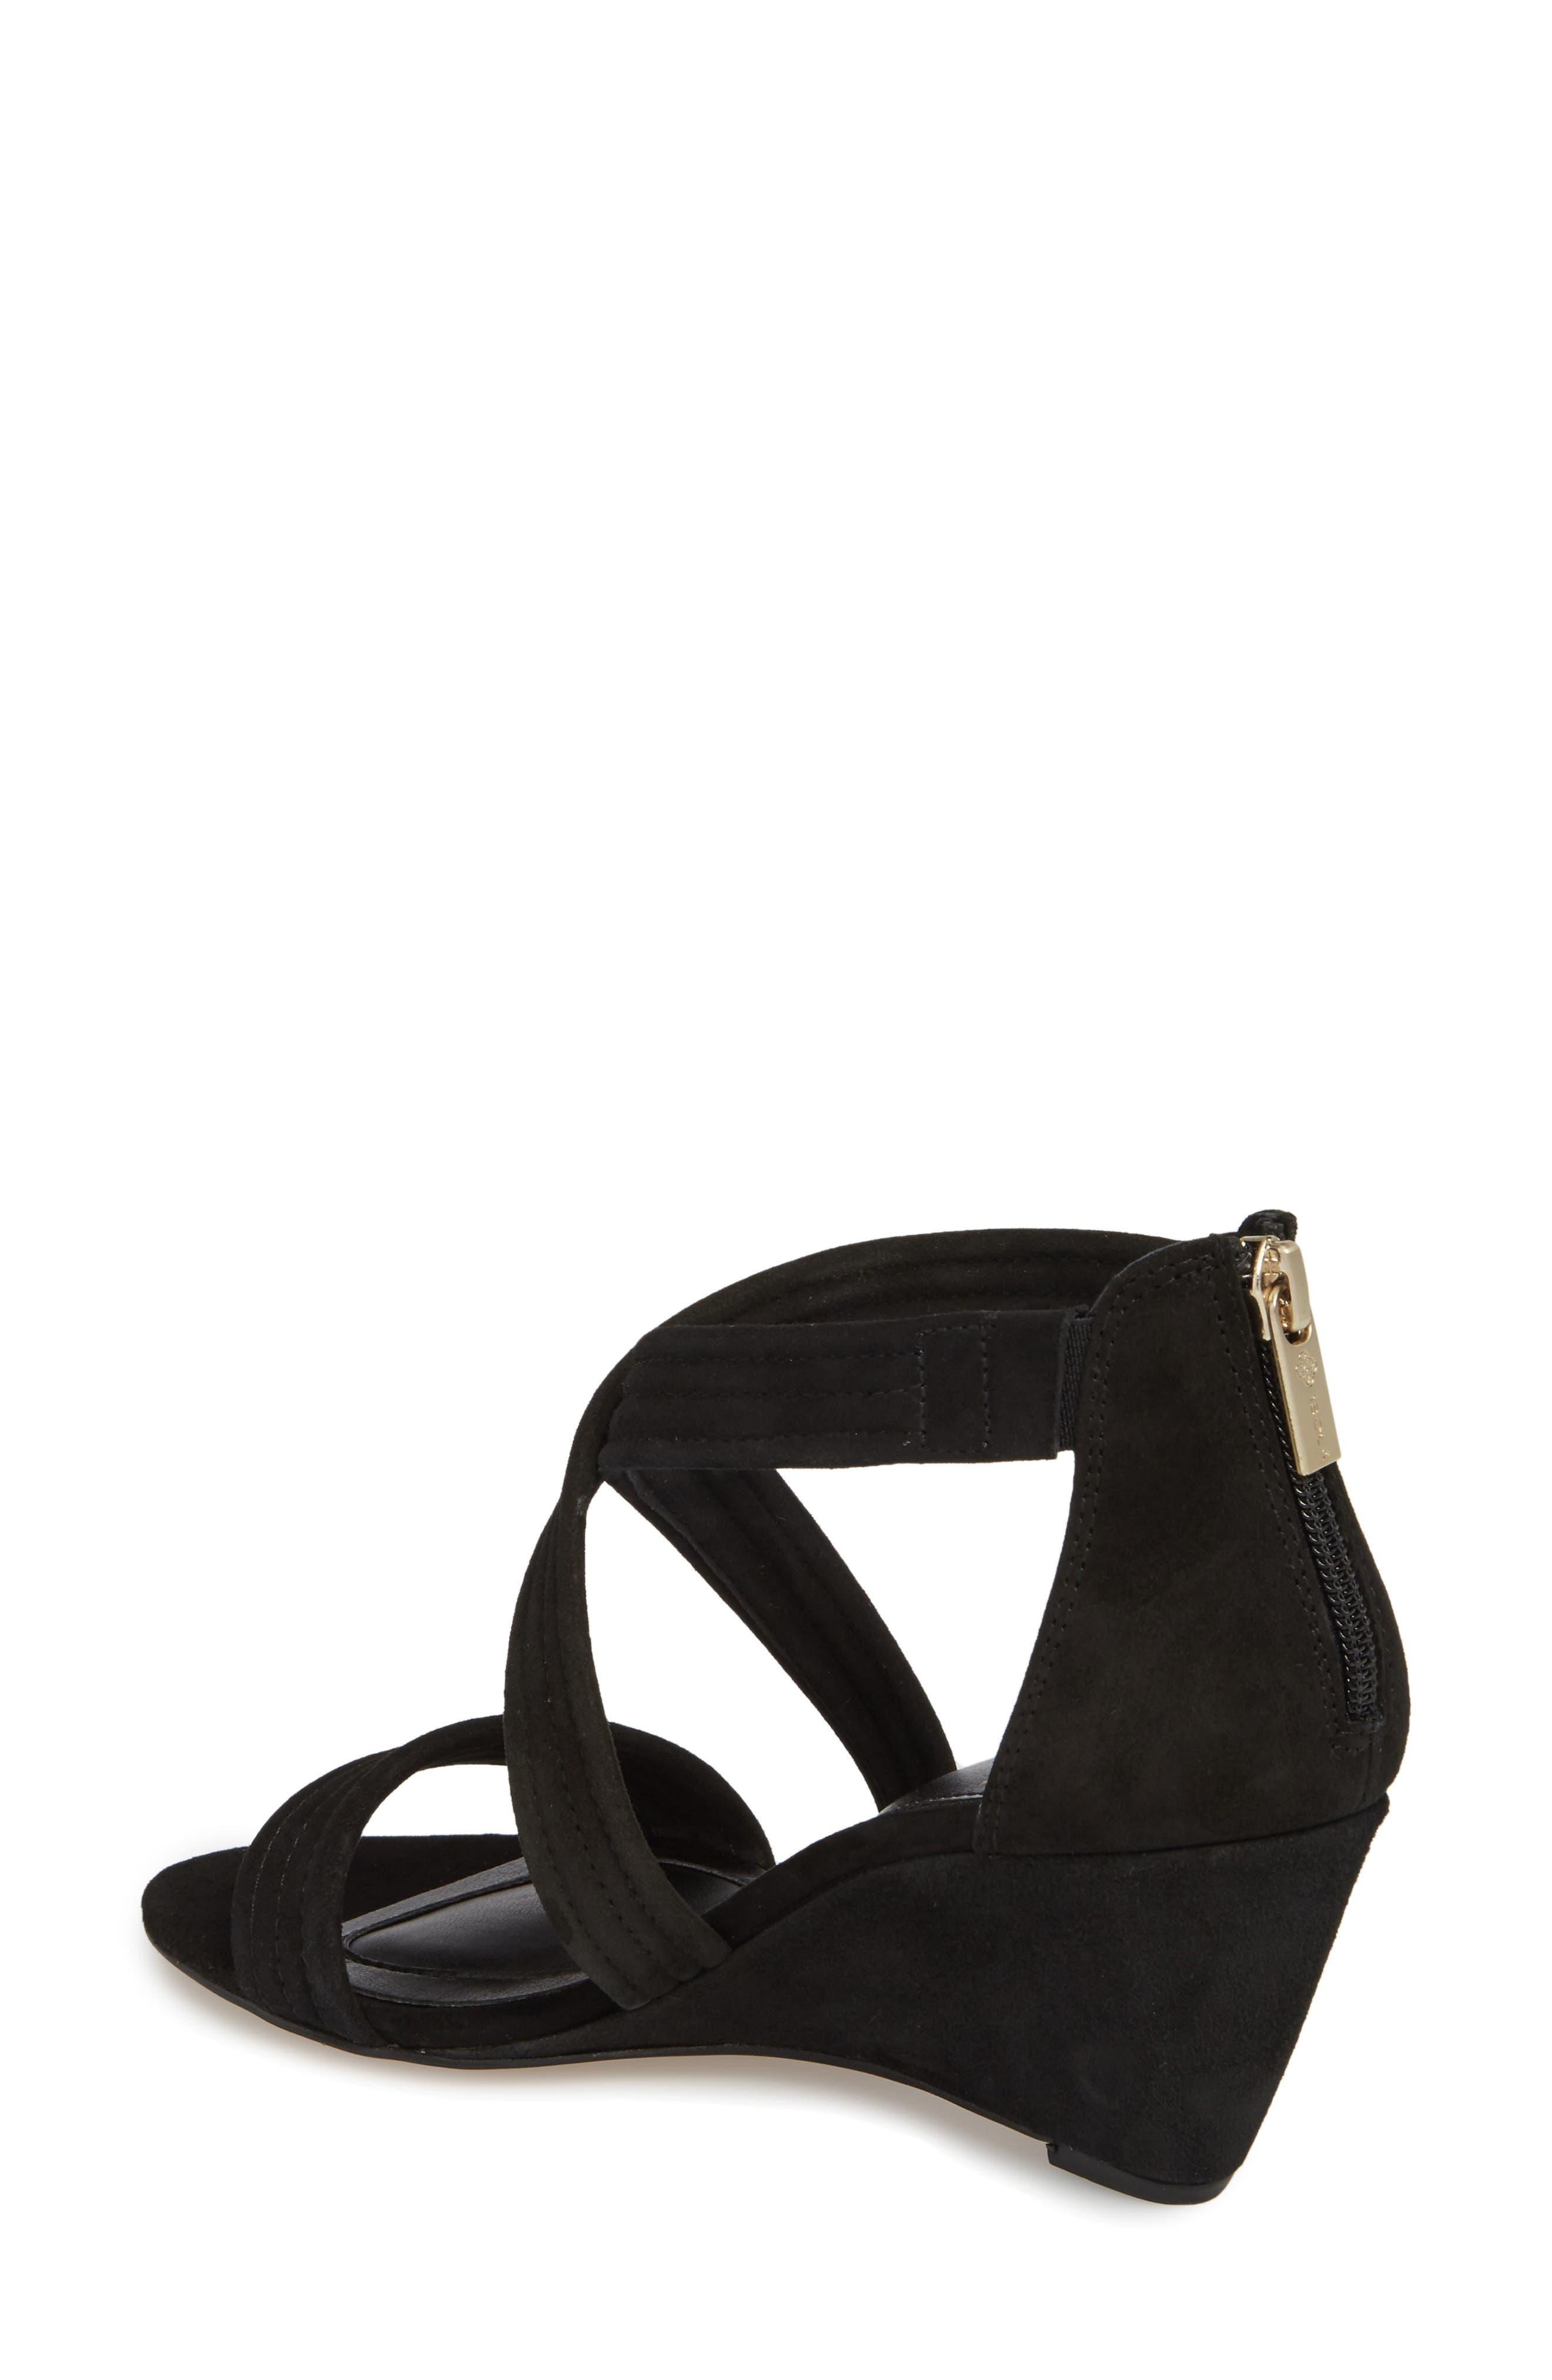 Fia Wedge Sandal,                             Alternate thumbnail 2, color,                             BLACK SUEDE